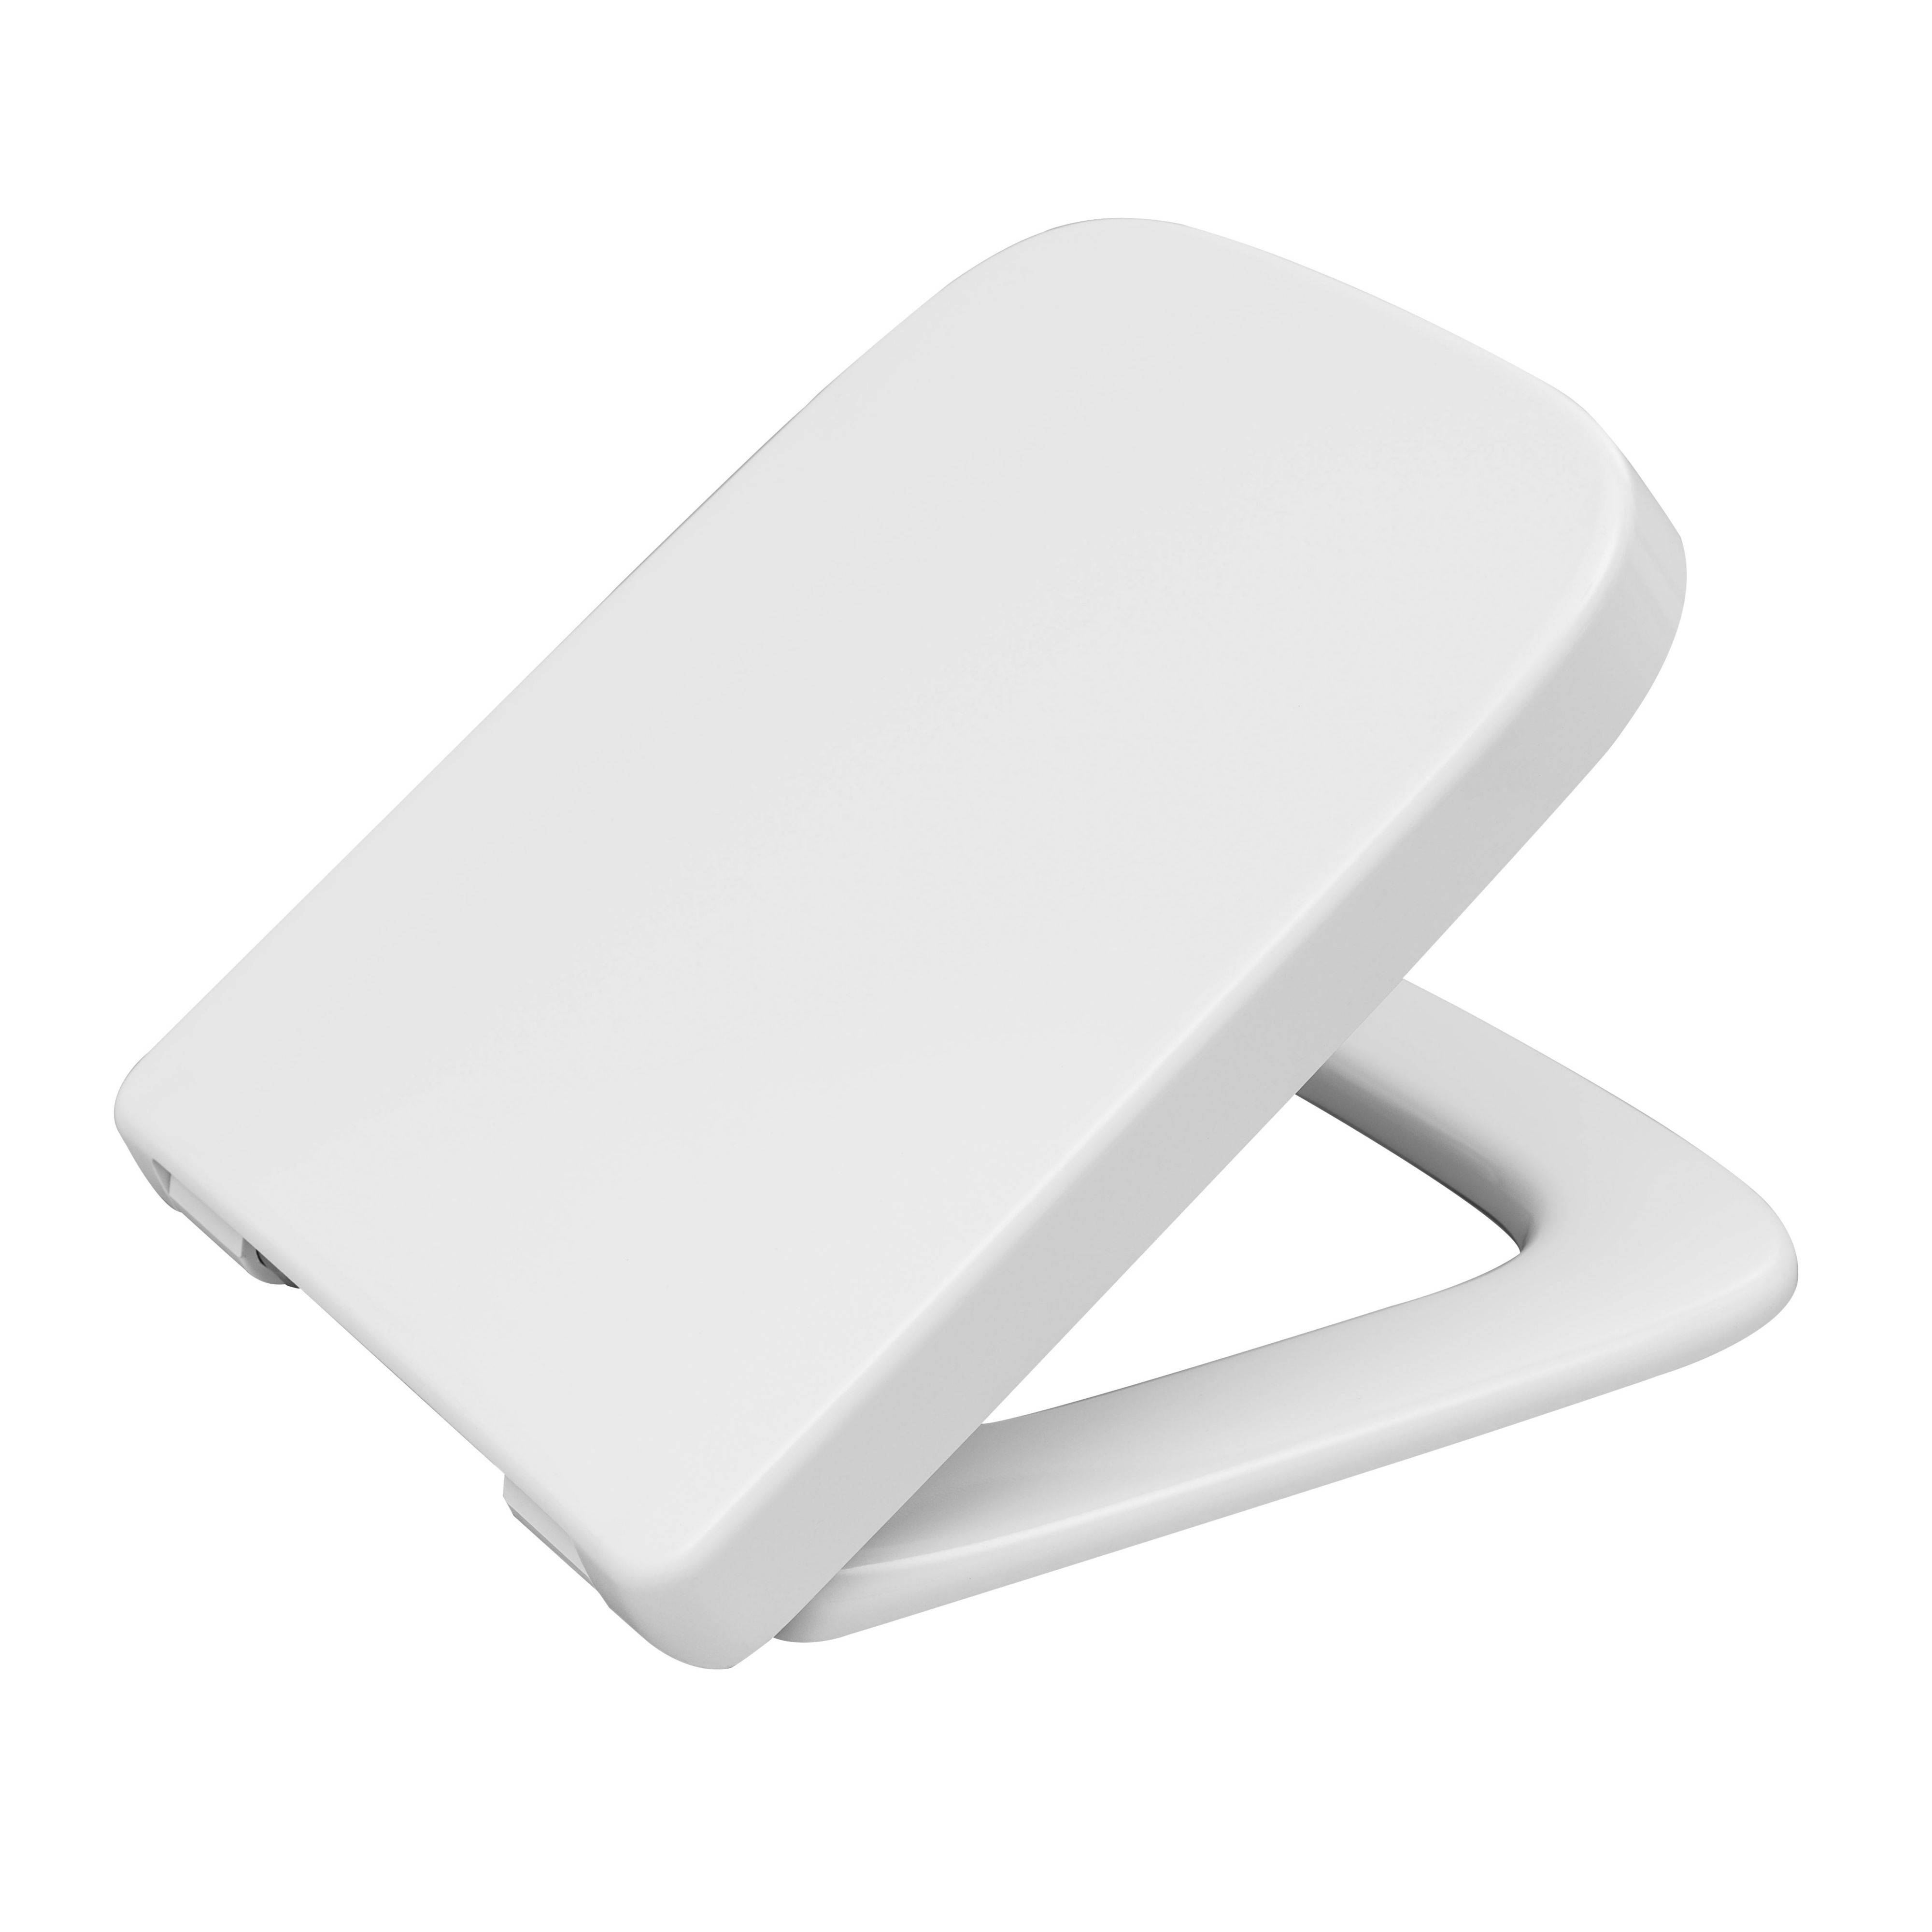 Superb Cedo Fabian White Soft Close Toilet Seat Departments Diy At Bq Creativecarmelina Interior Chair Design Creativecarmelinacom